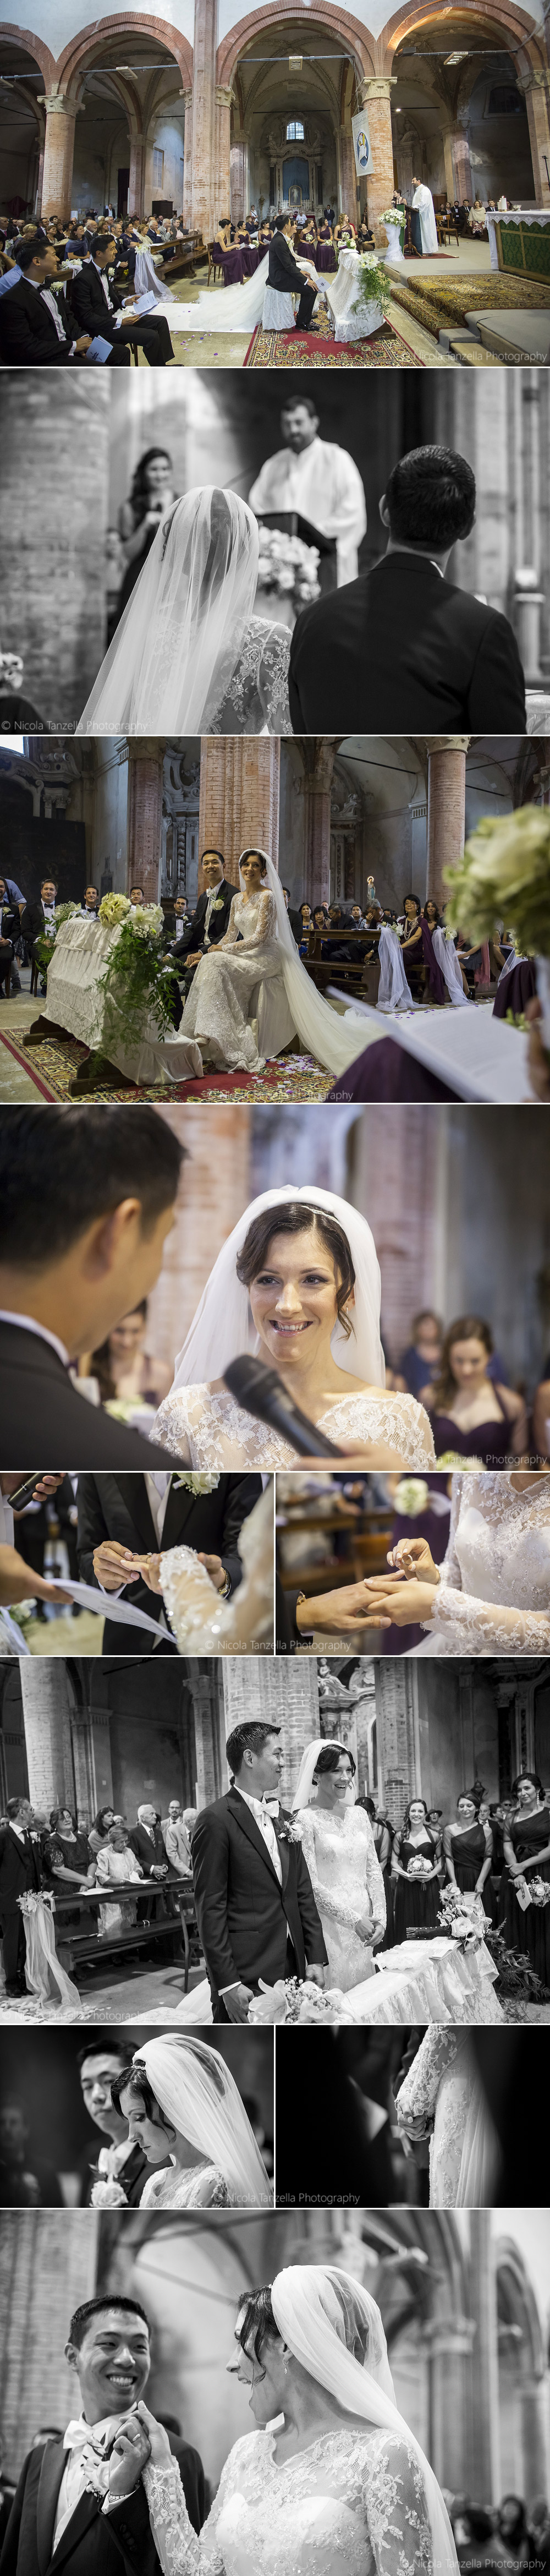 fotografo matrimonio modena -005